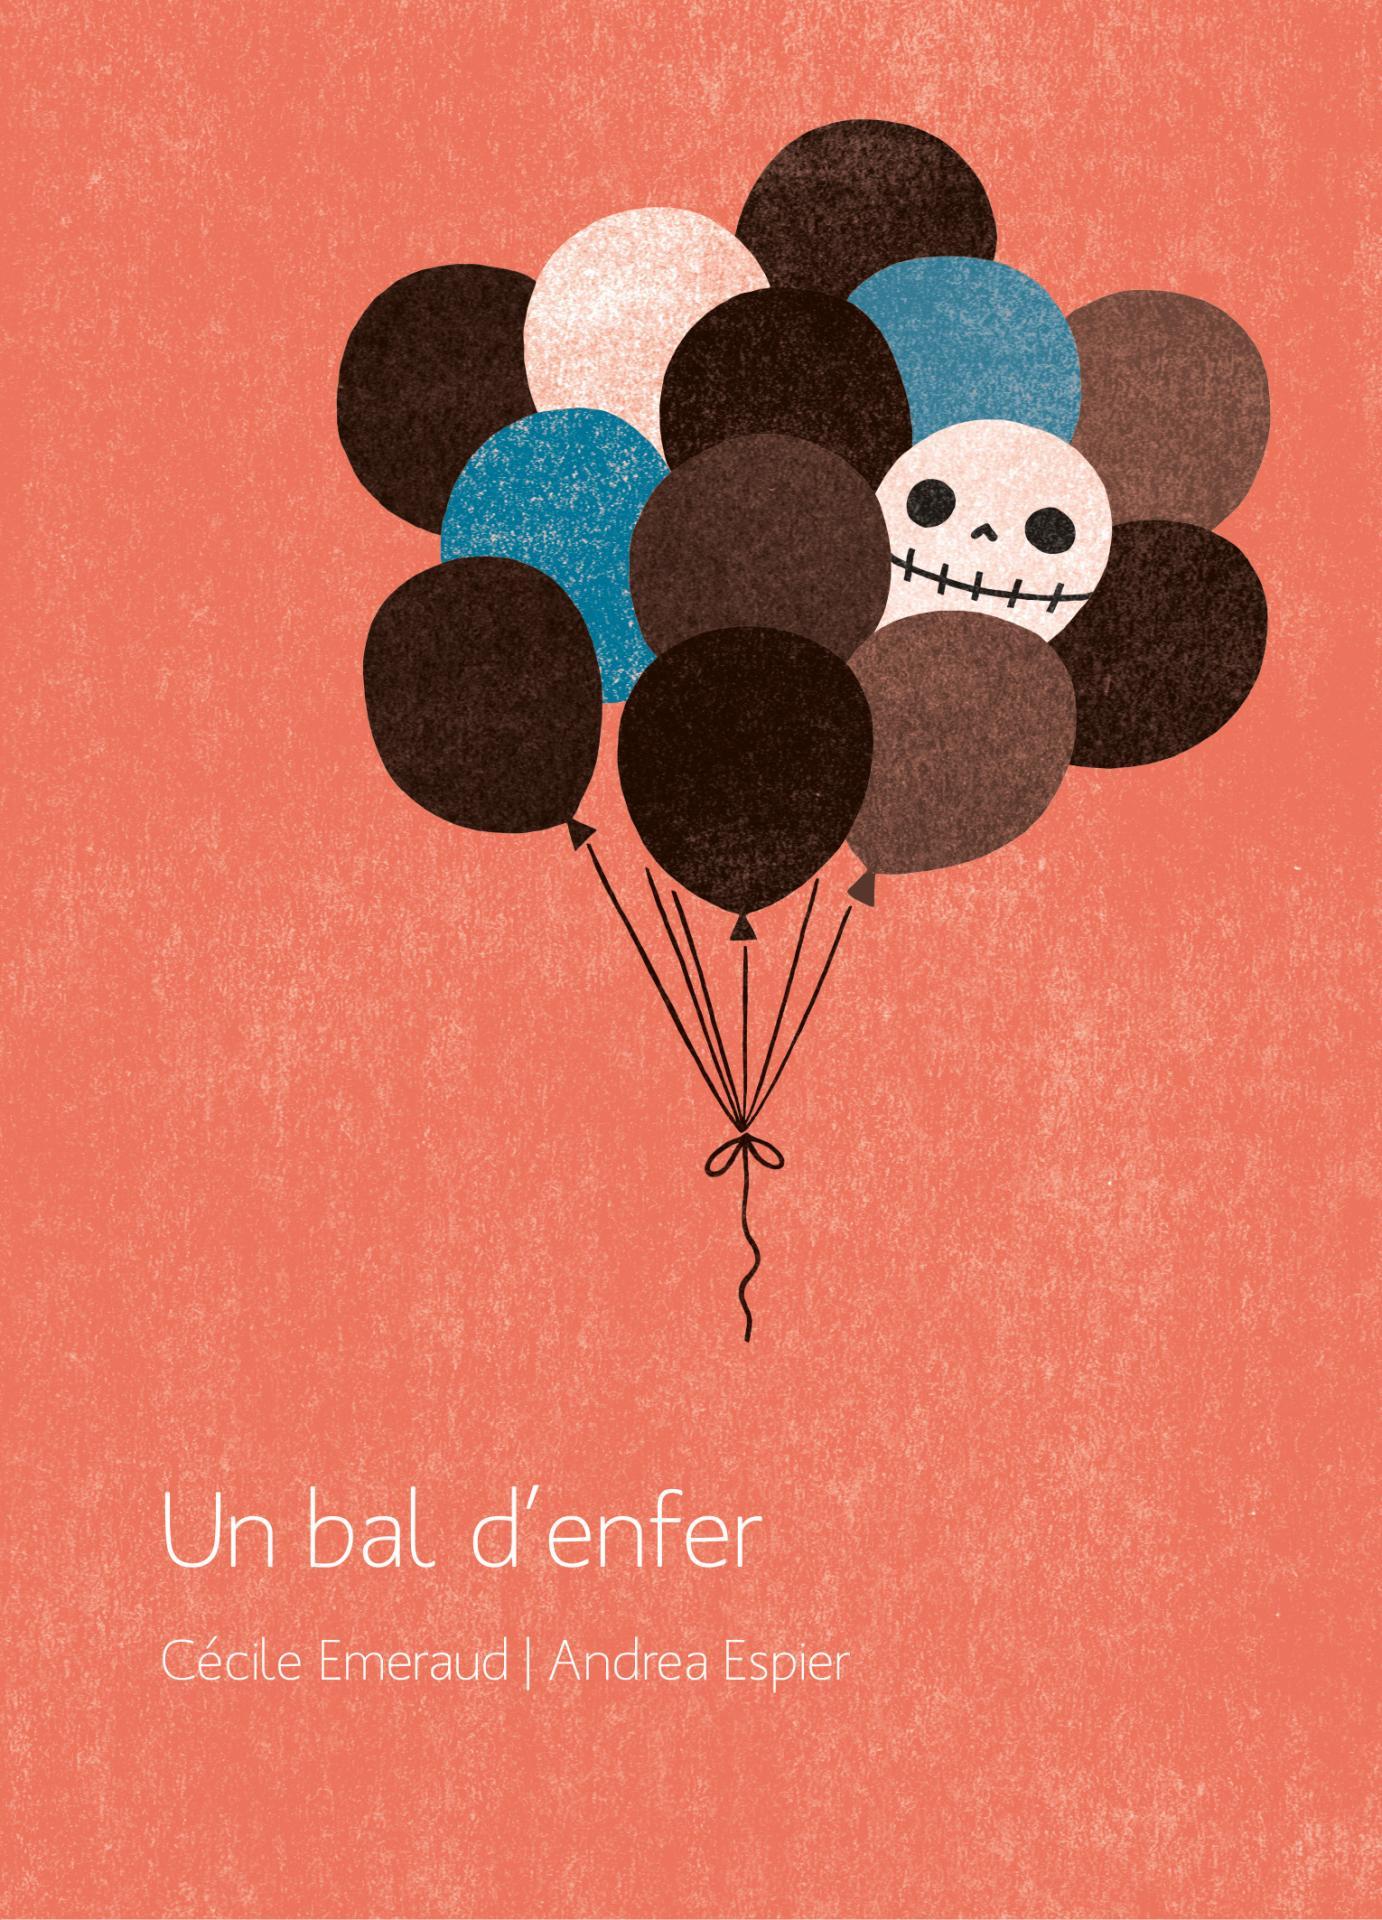 Un bal d'enfer